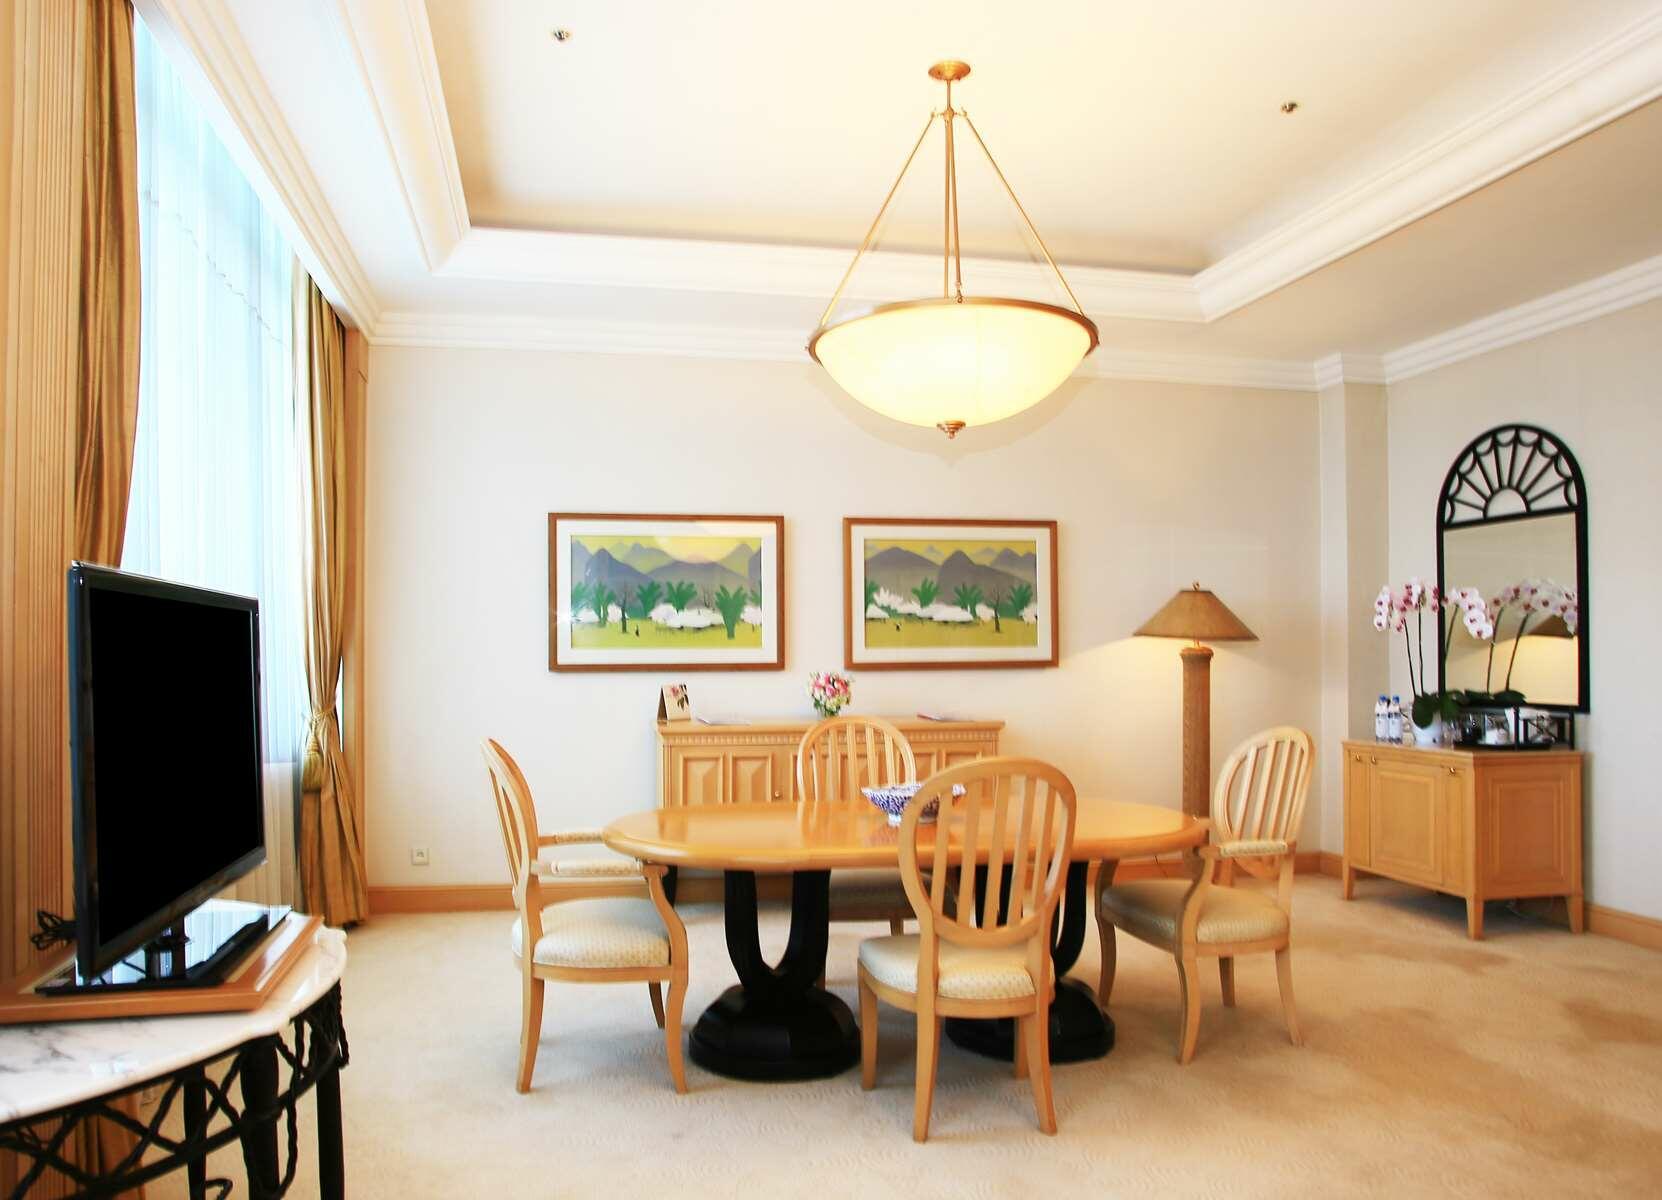 Senator Suite   Accommodation Hanoi Vietnam   Luxury Hotel Hanoi